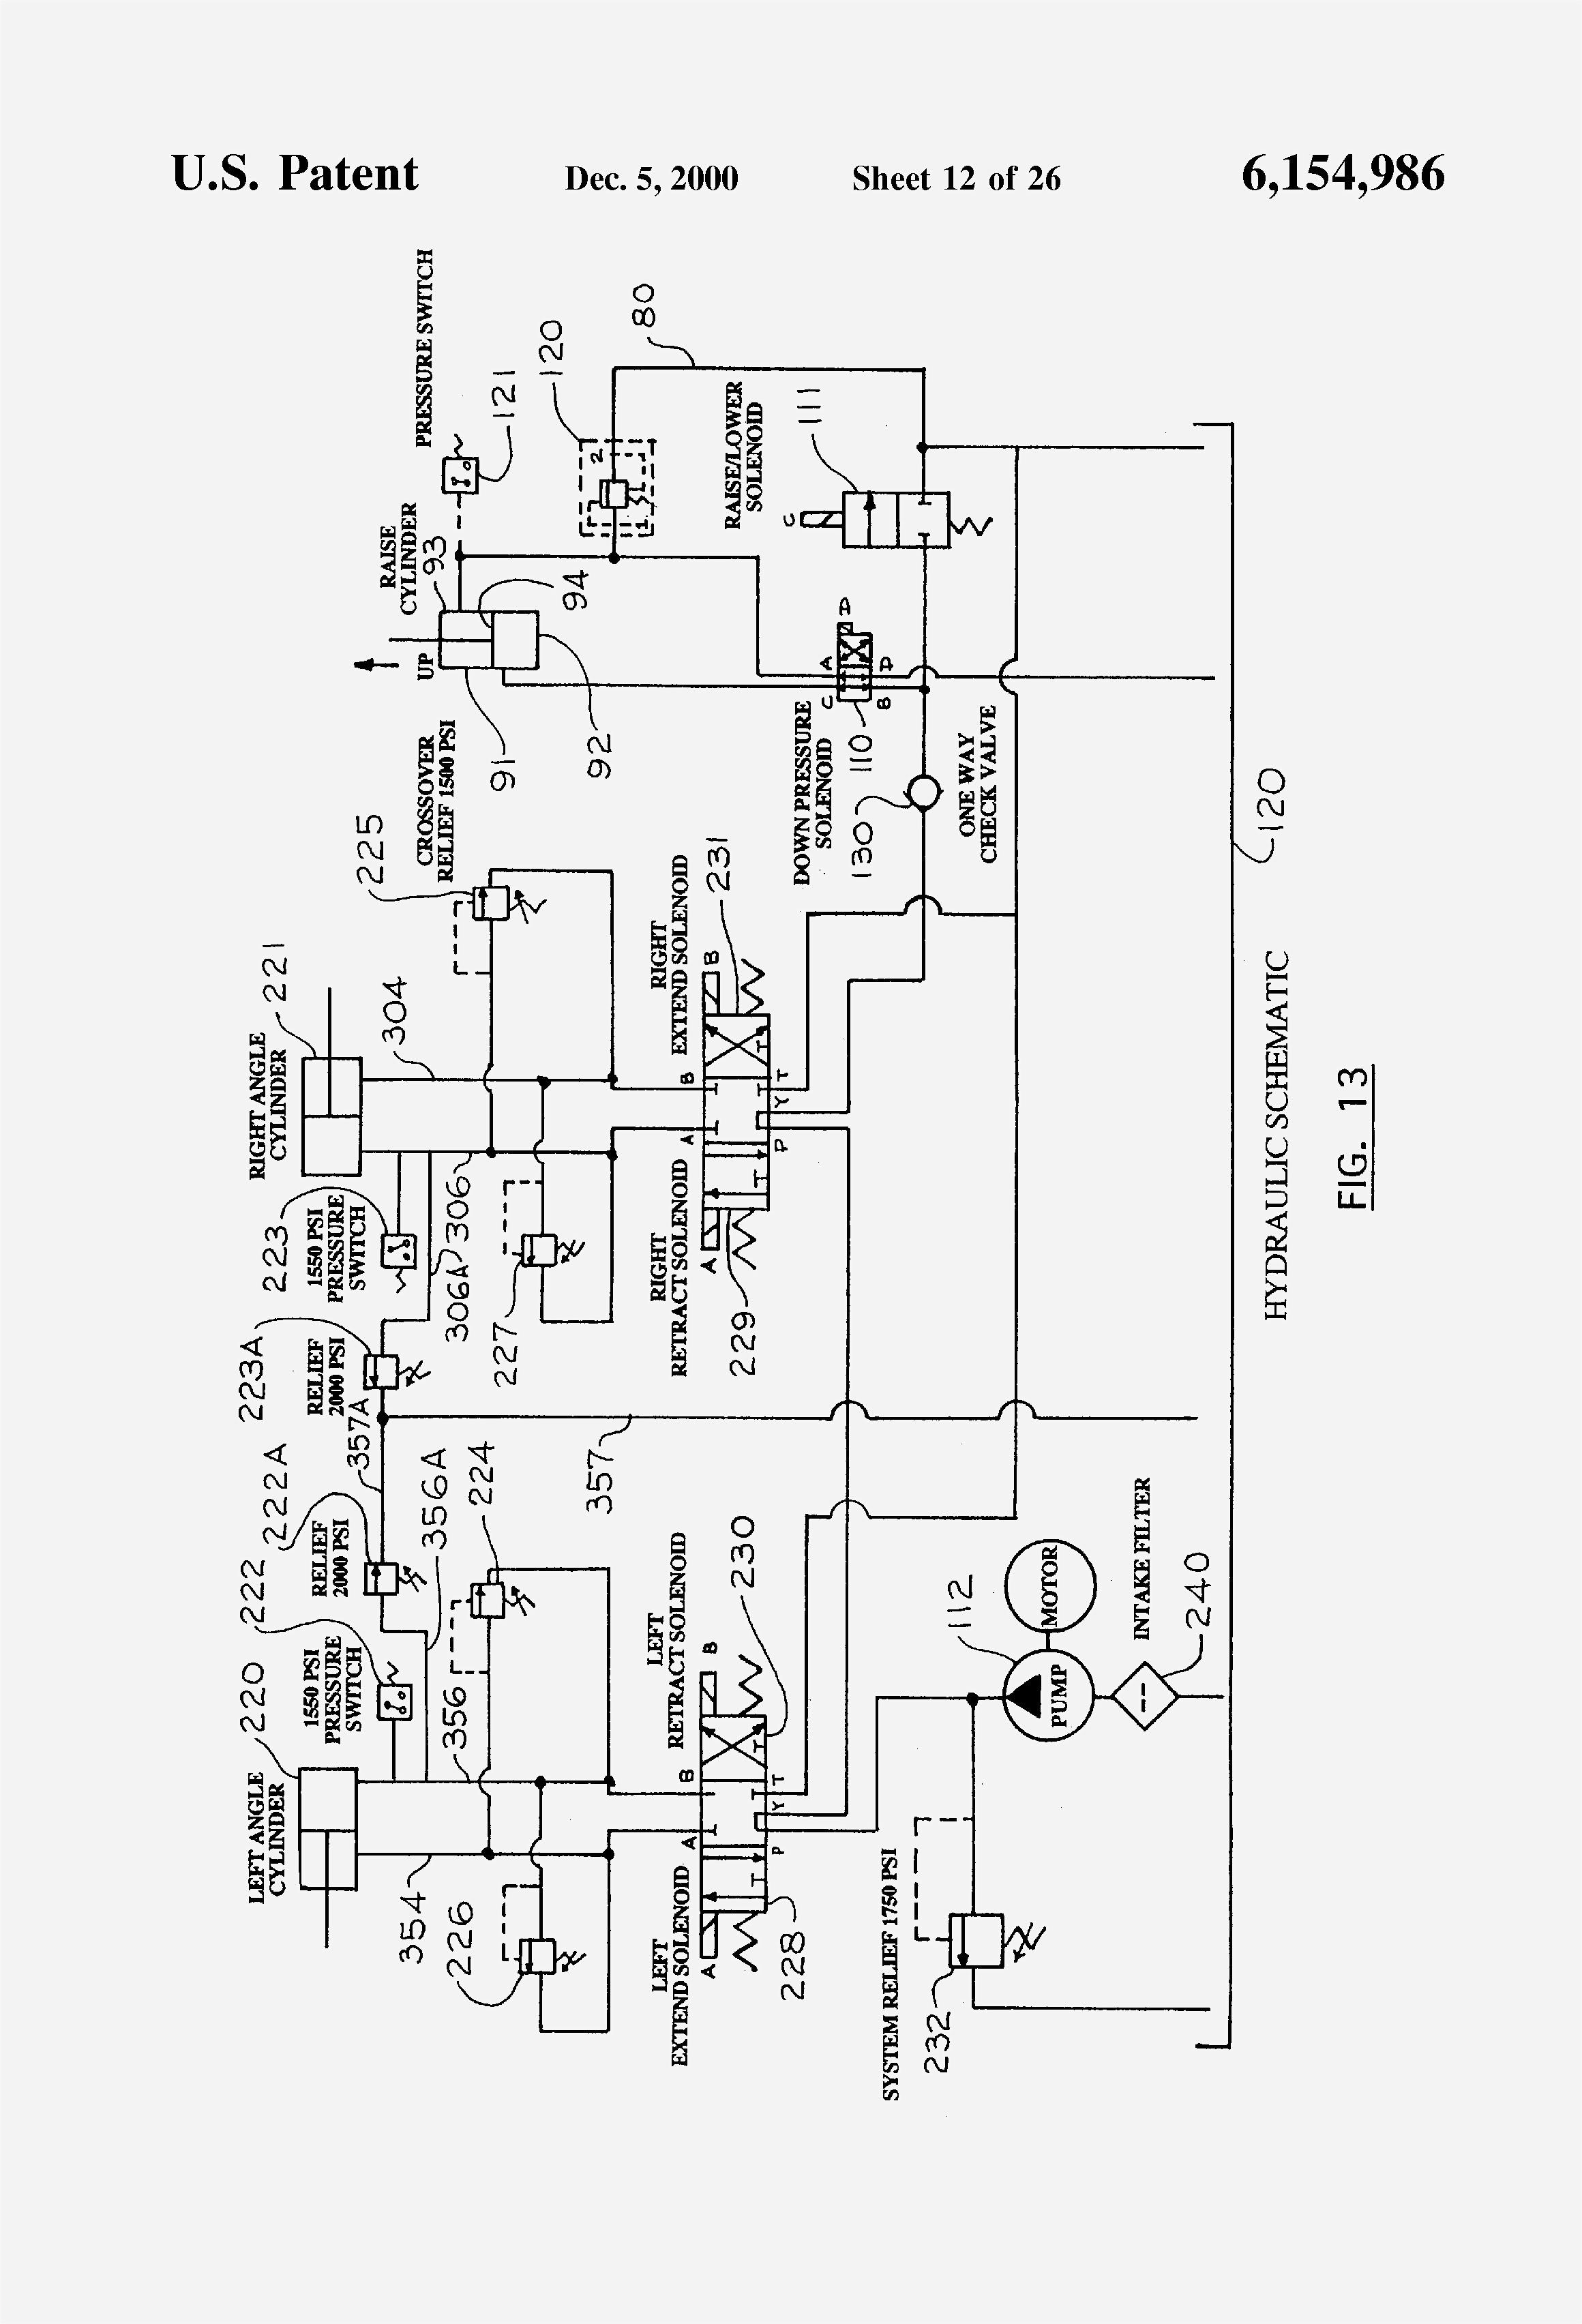 Fisher Plow Wiring Diagram Minute Mount 1 3 Plug Harness 3I 2 - Fisher Plow Wiring Diagram Minute Mount 2